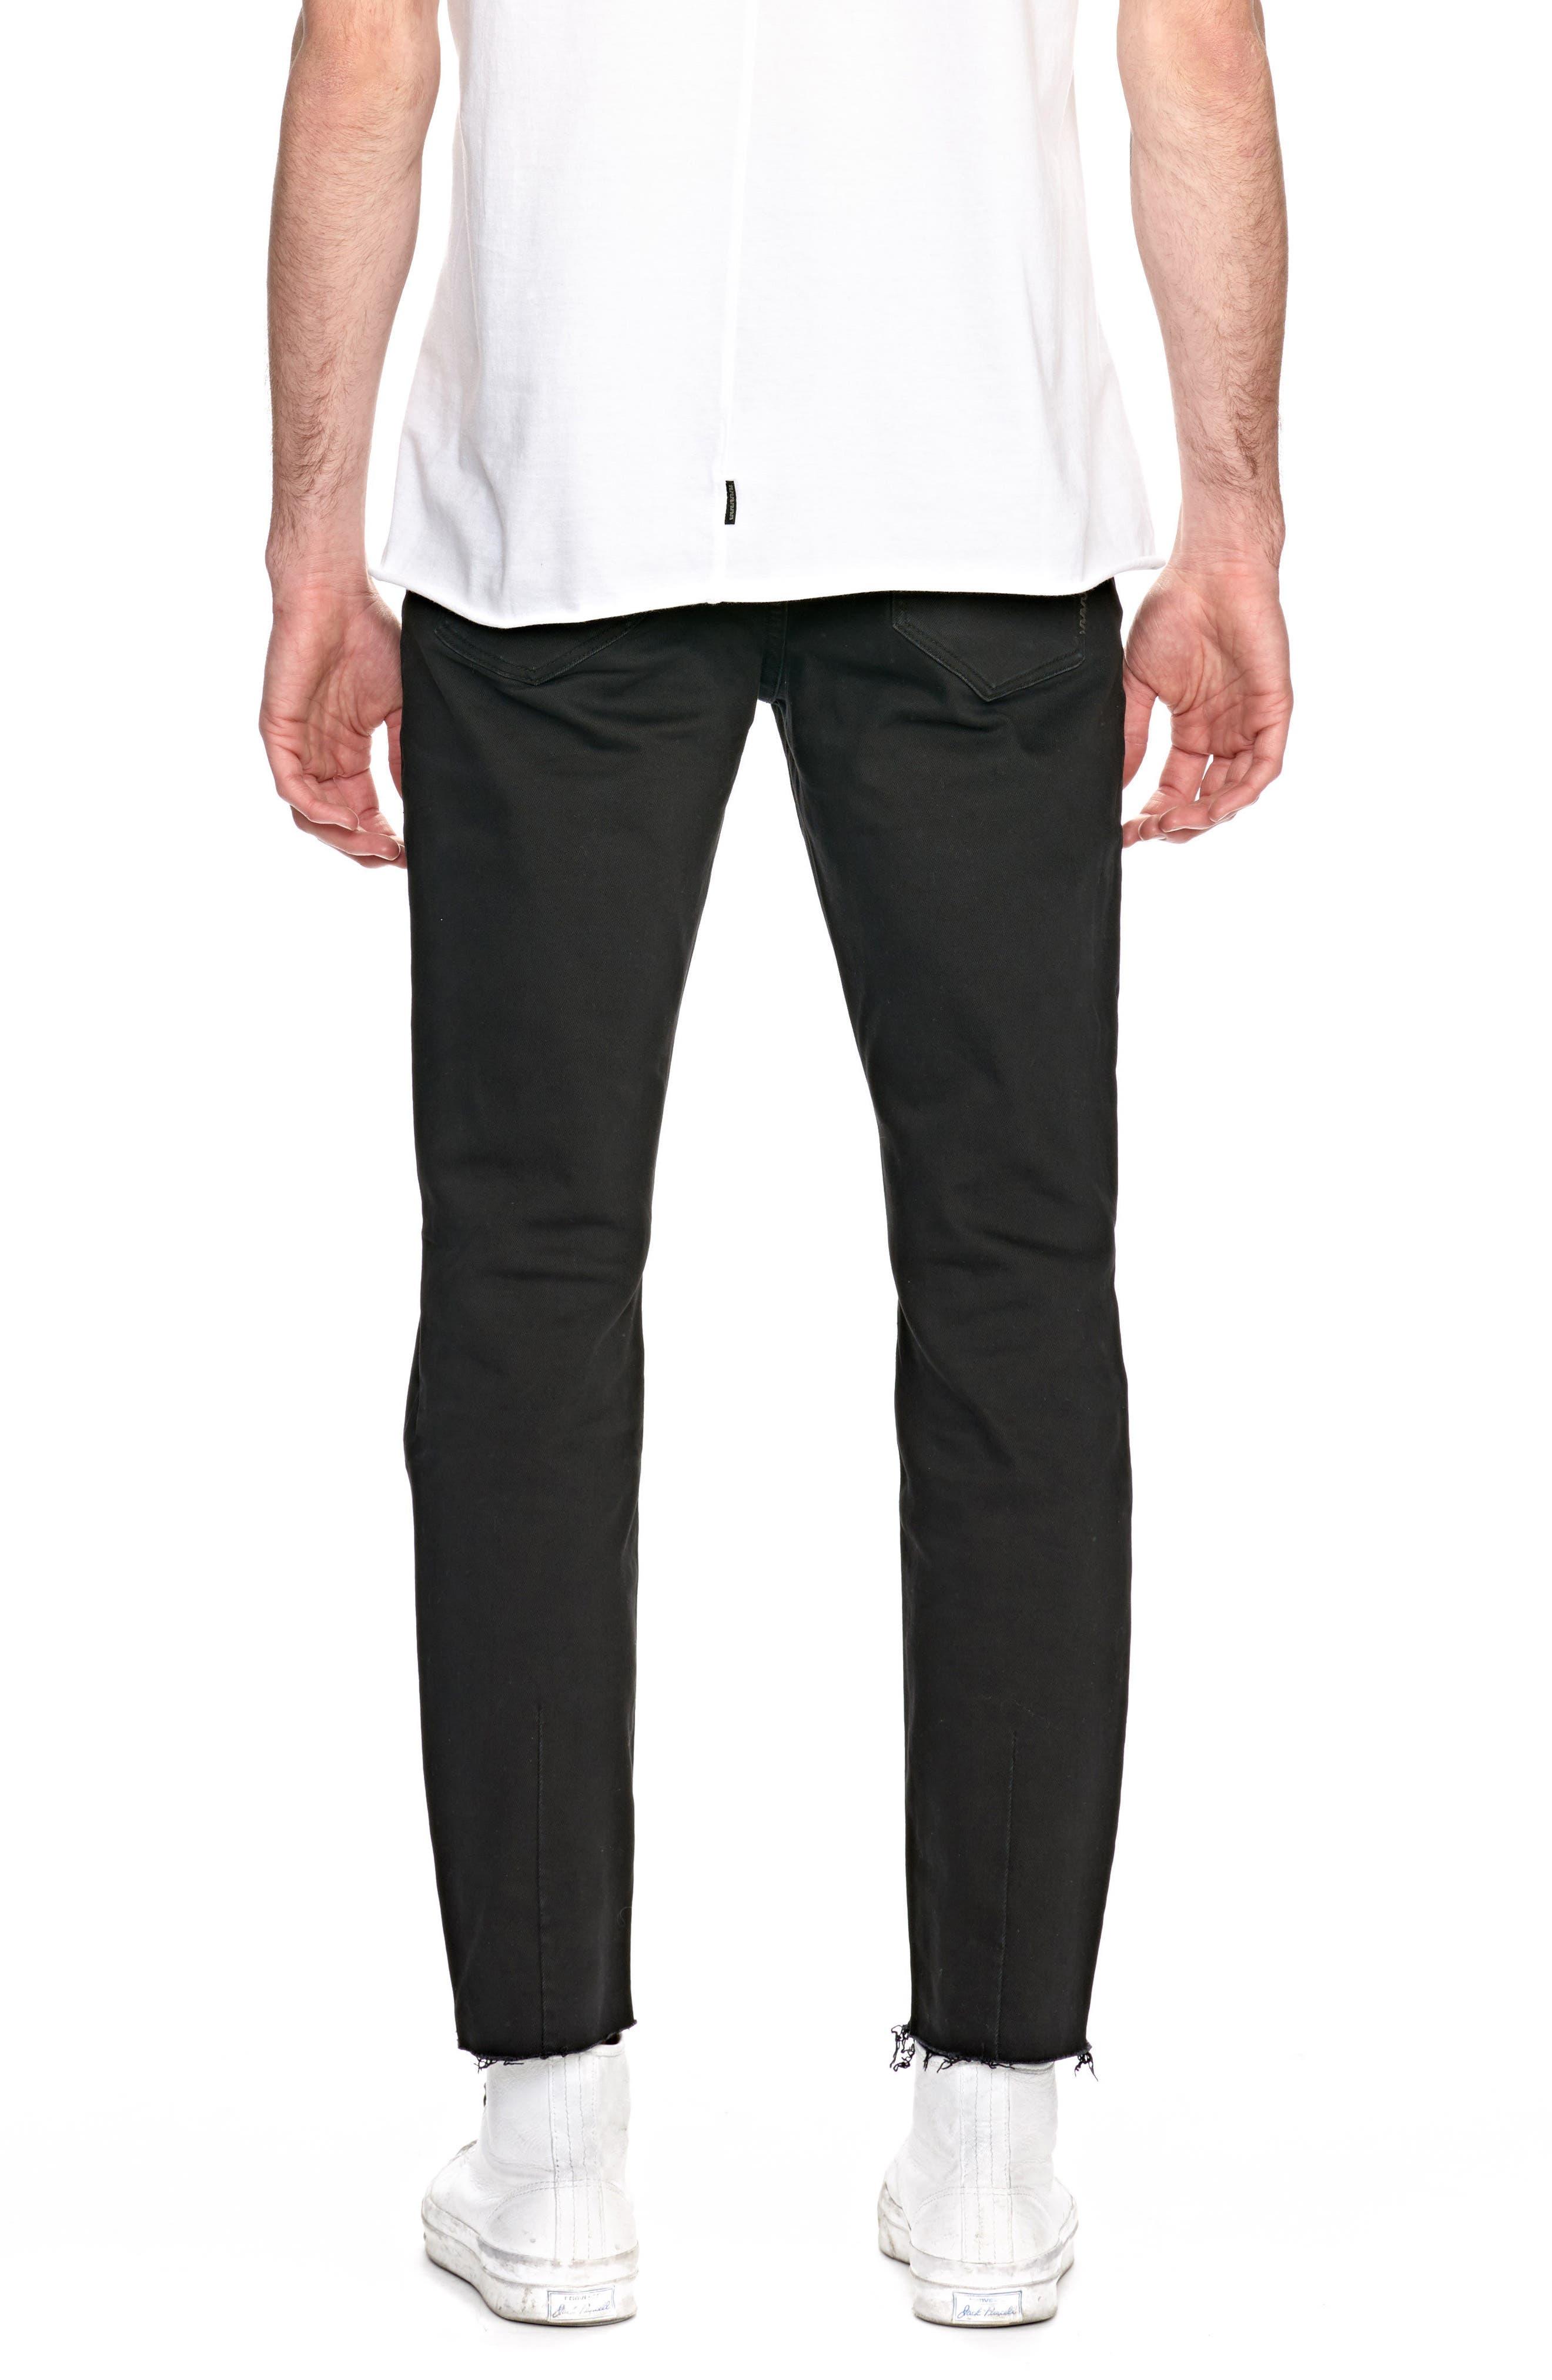 Iggy Skinny Fit Jeans,                             Alternate thumbnail 2, color,                             Porter